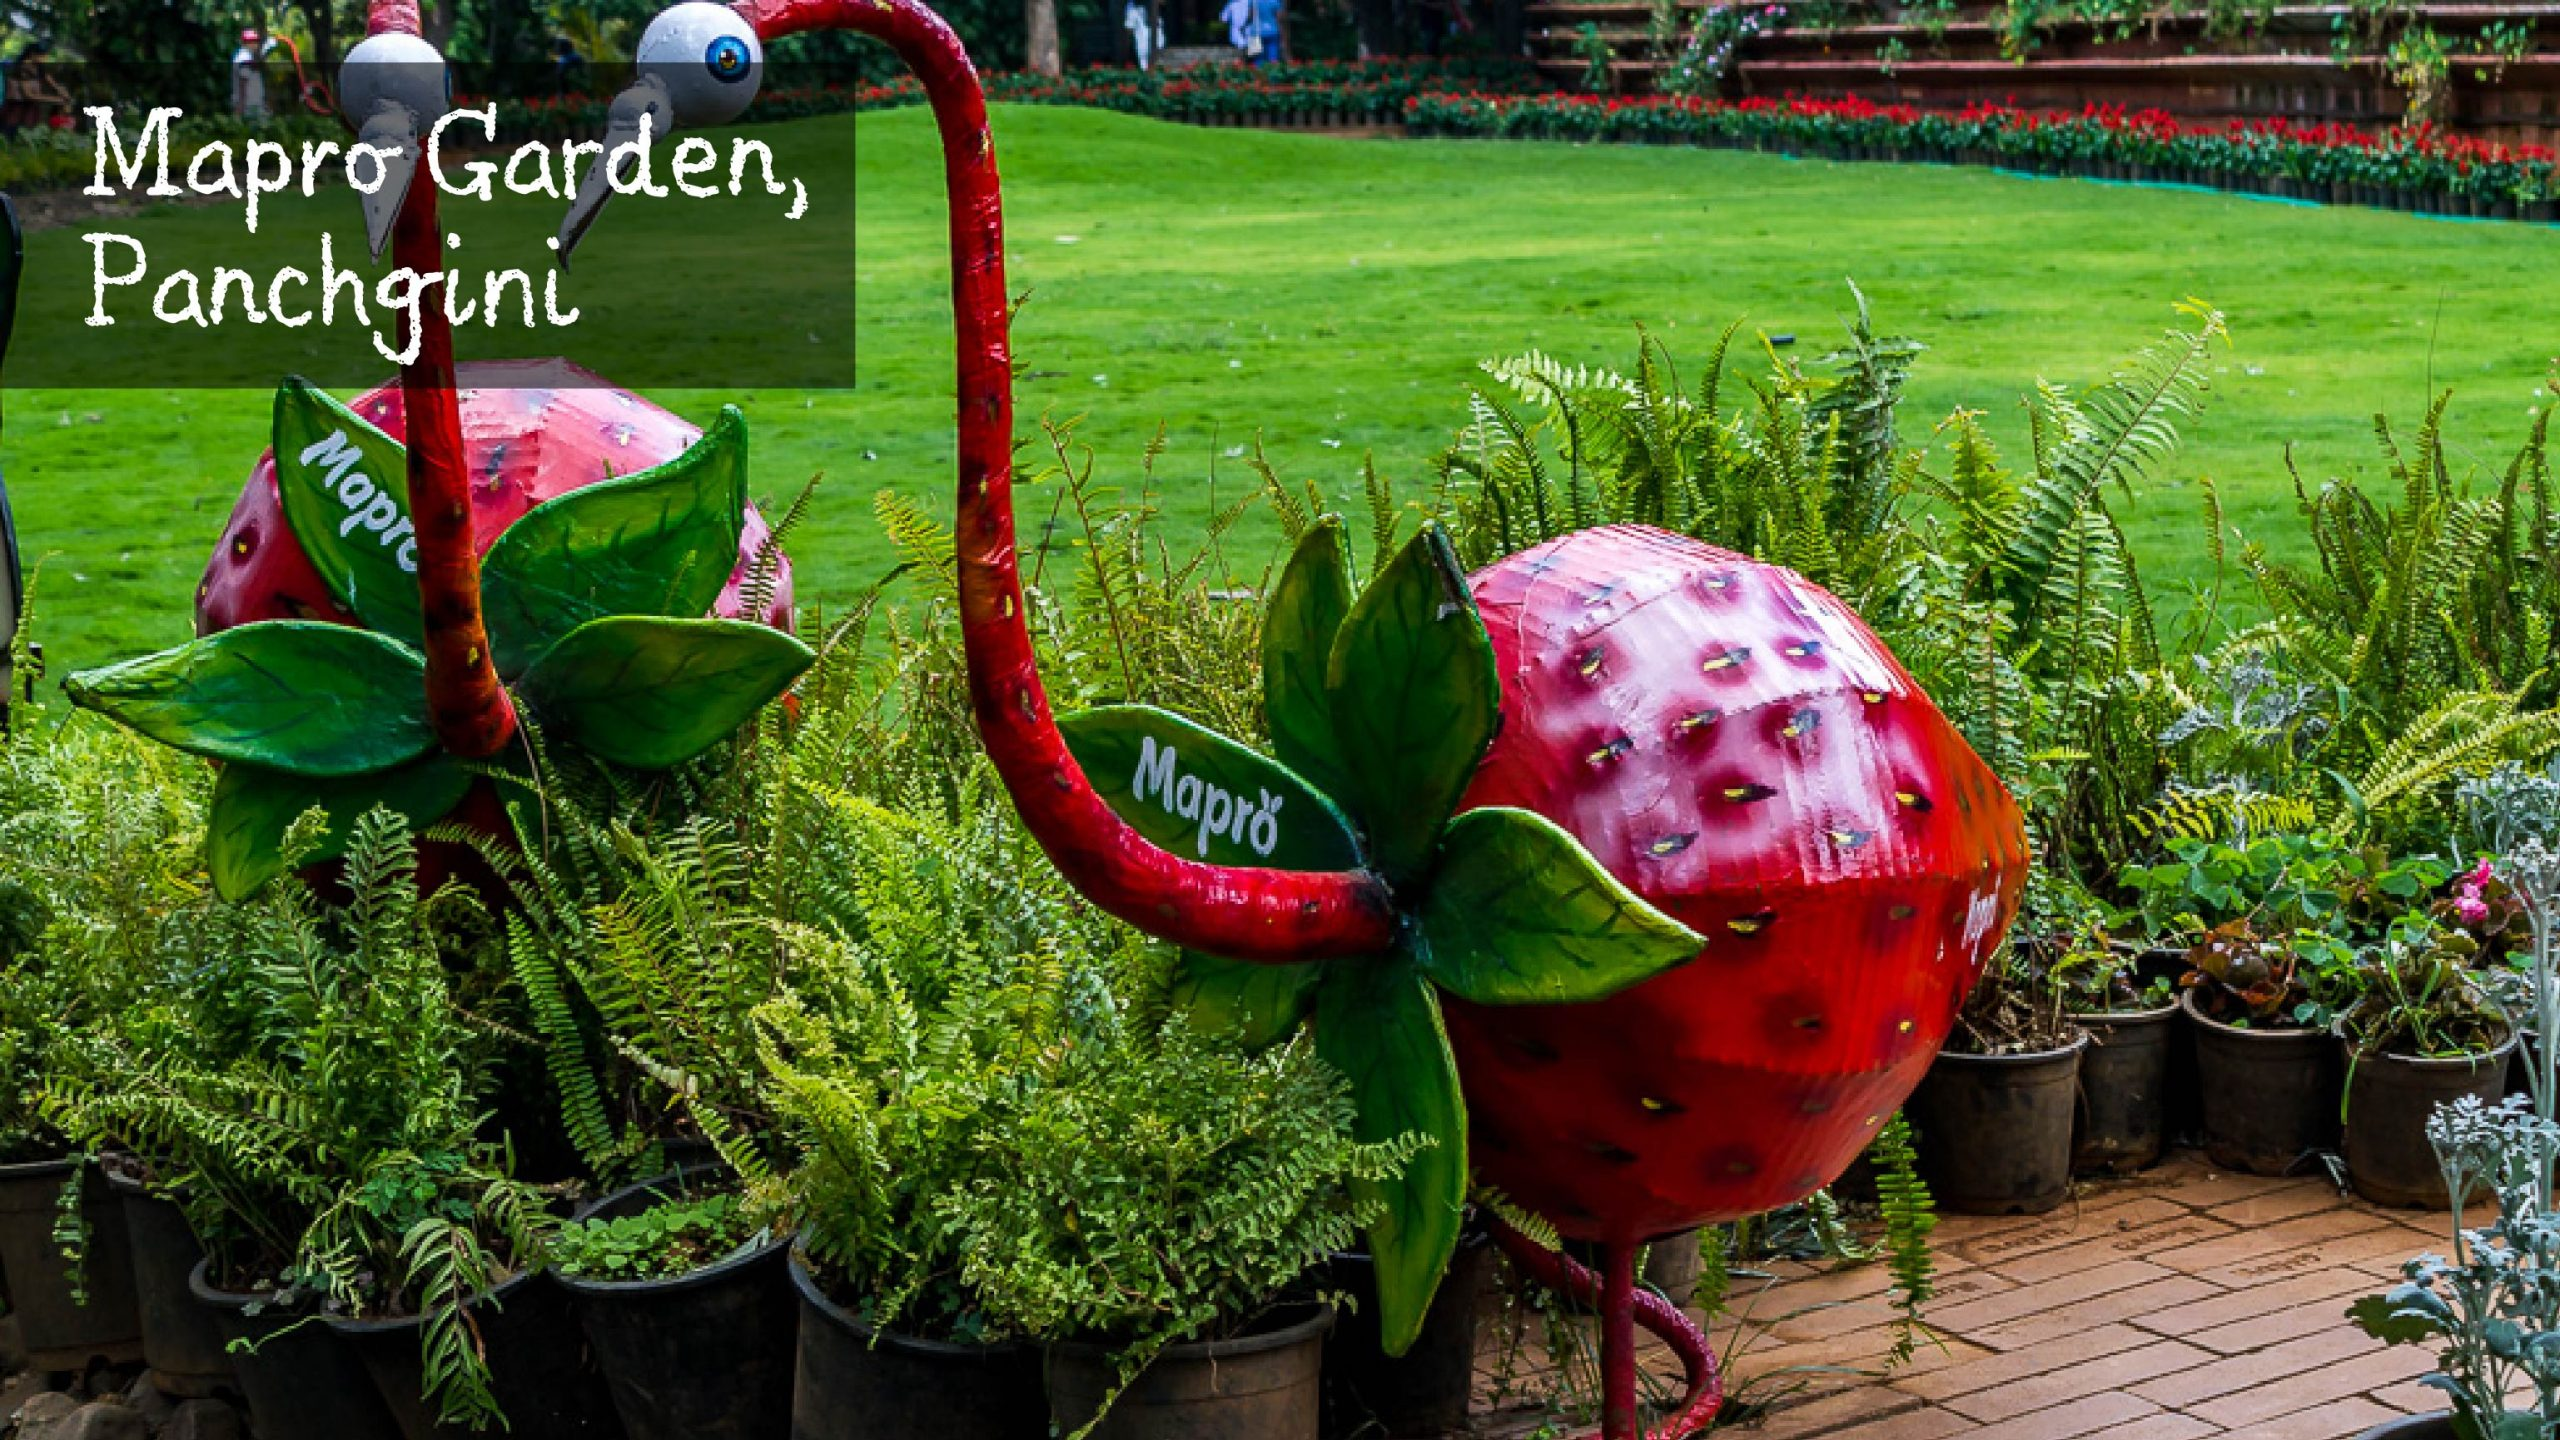 Mapro Garden Panchgani Maharashtra